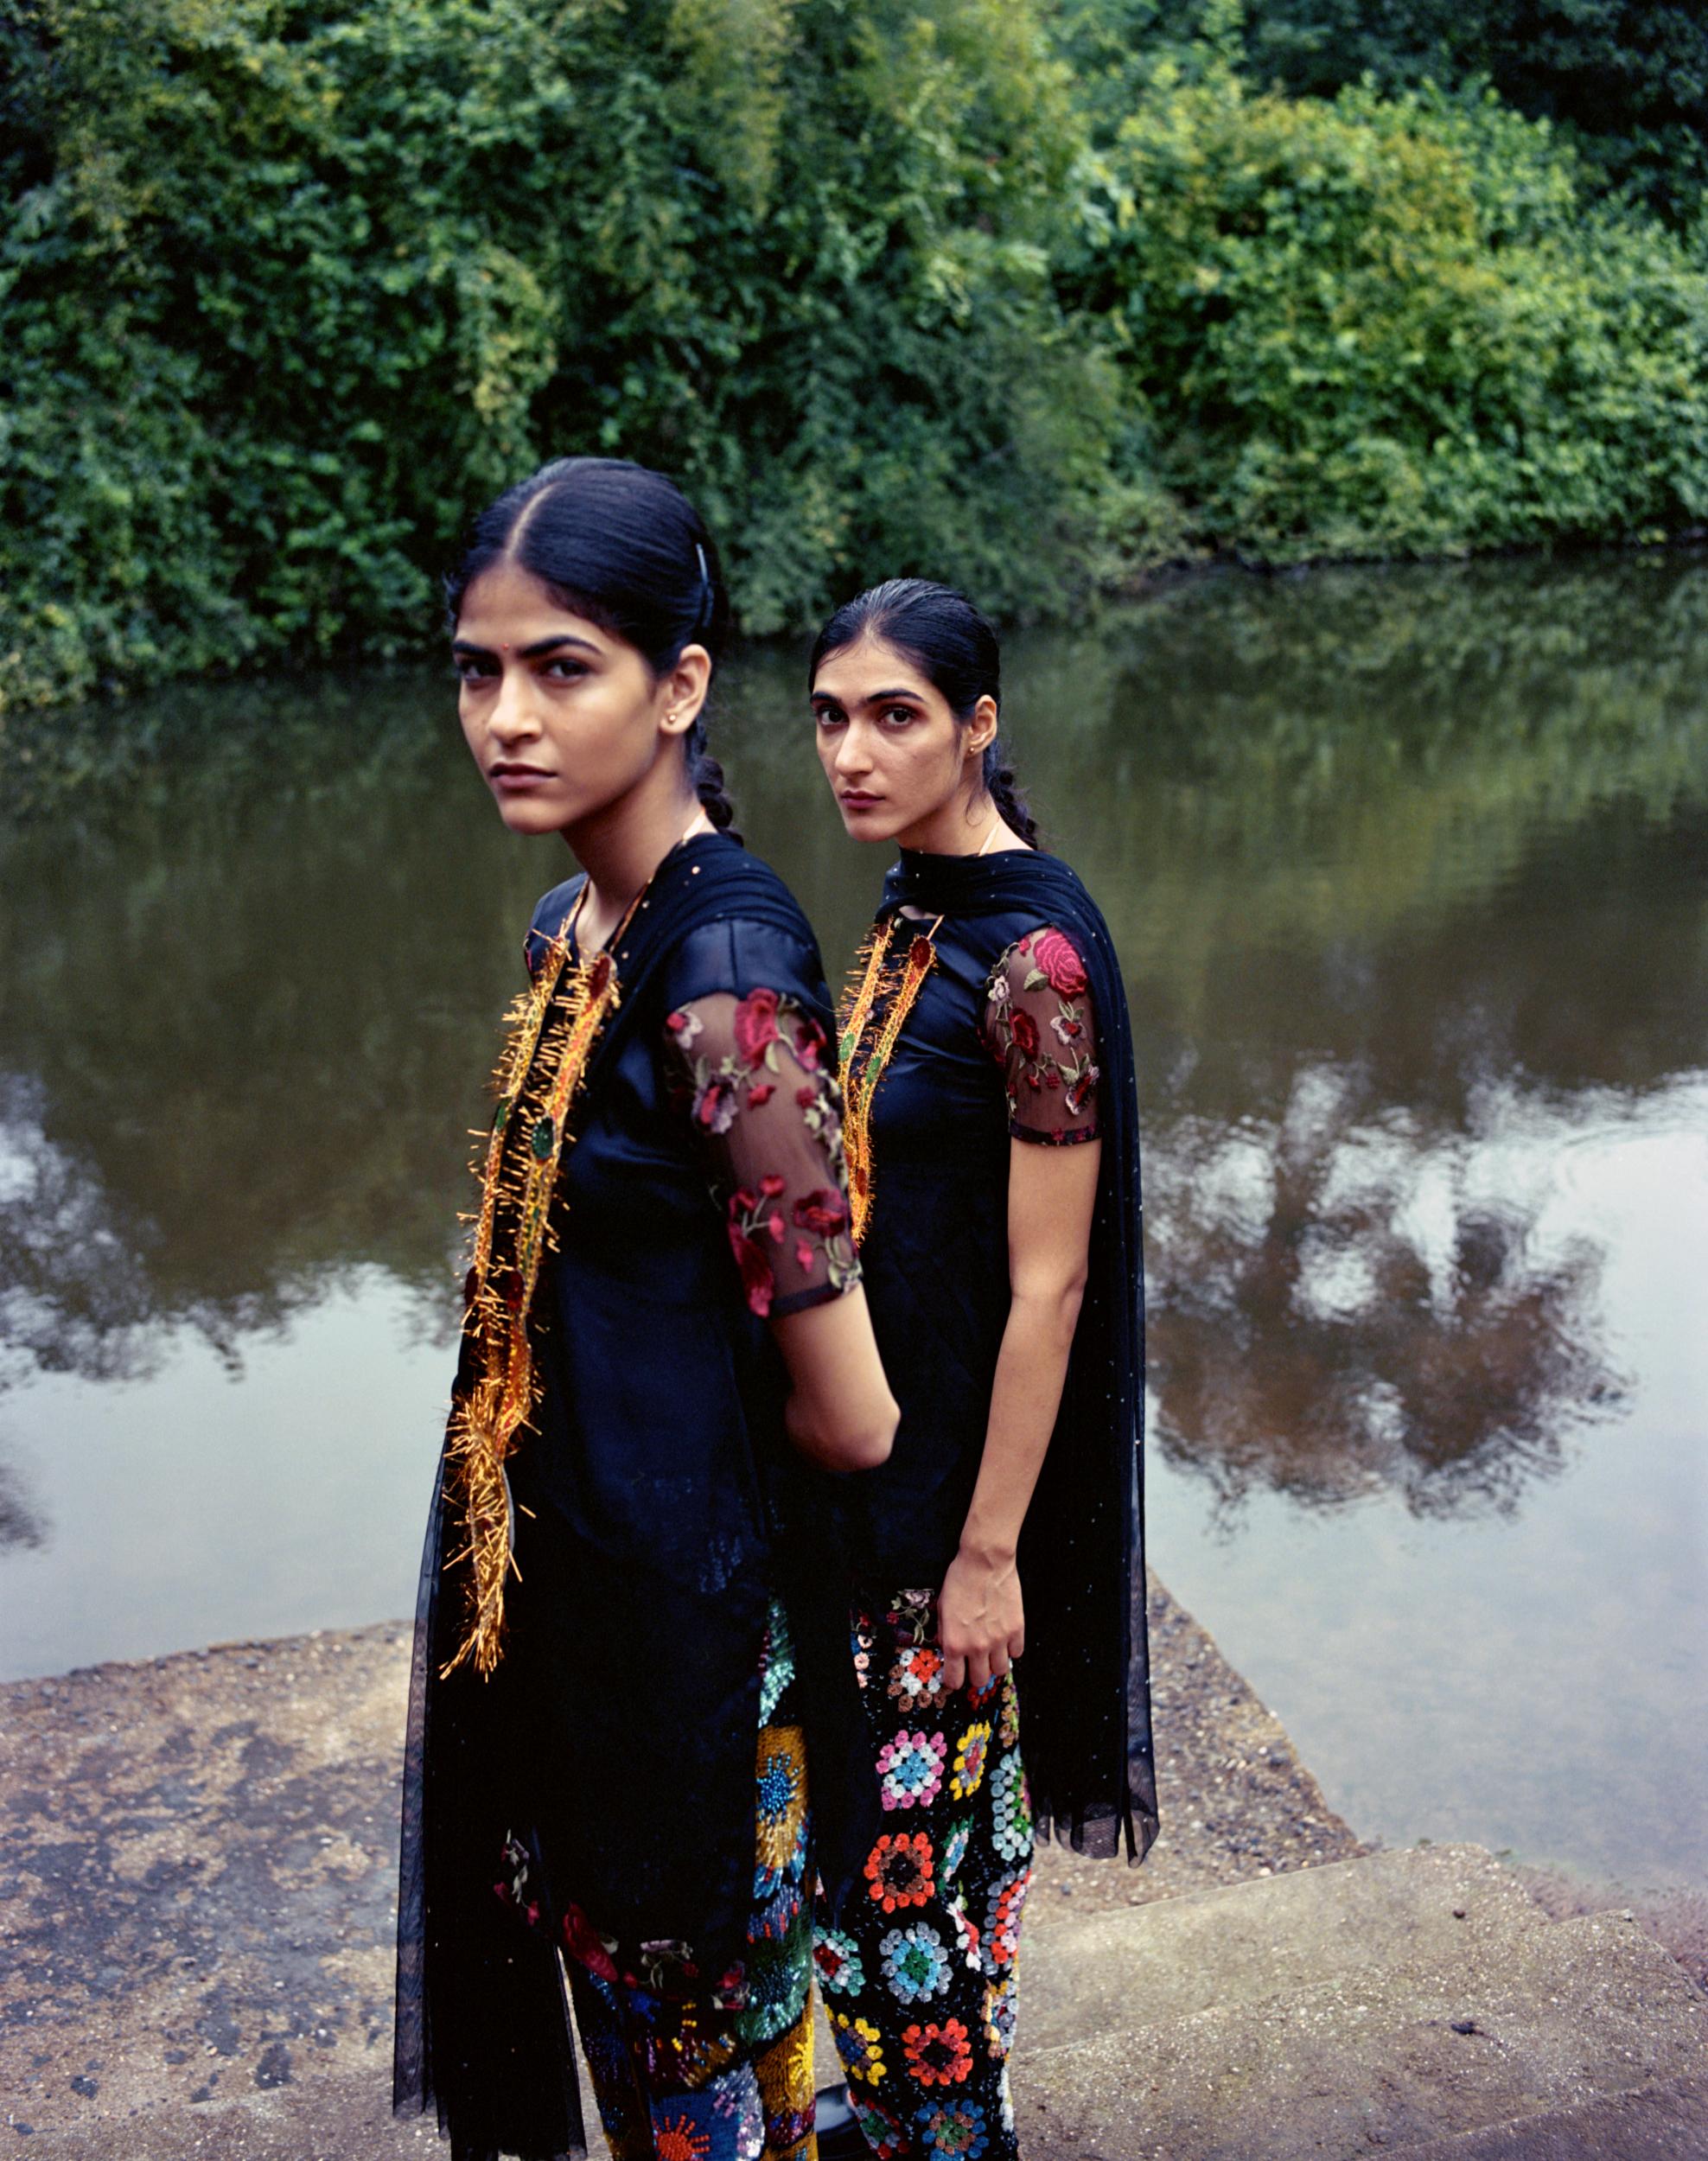 Ashish love in small town India 2.jpeg